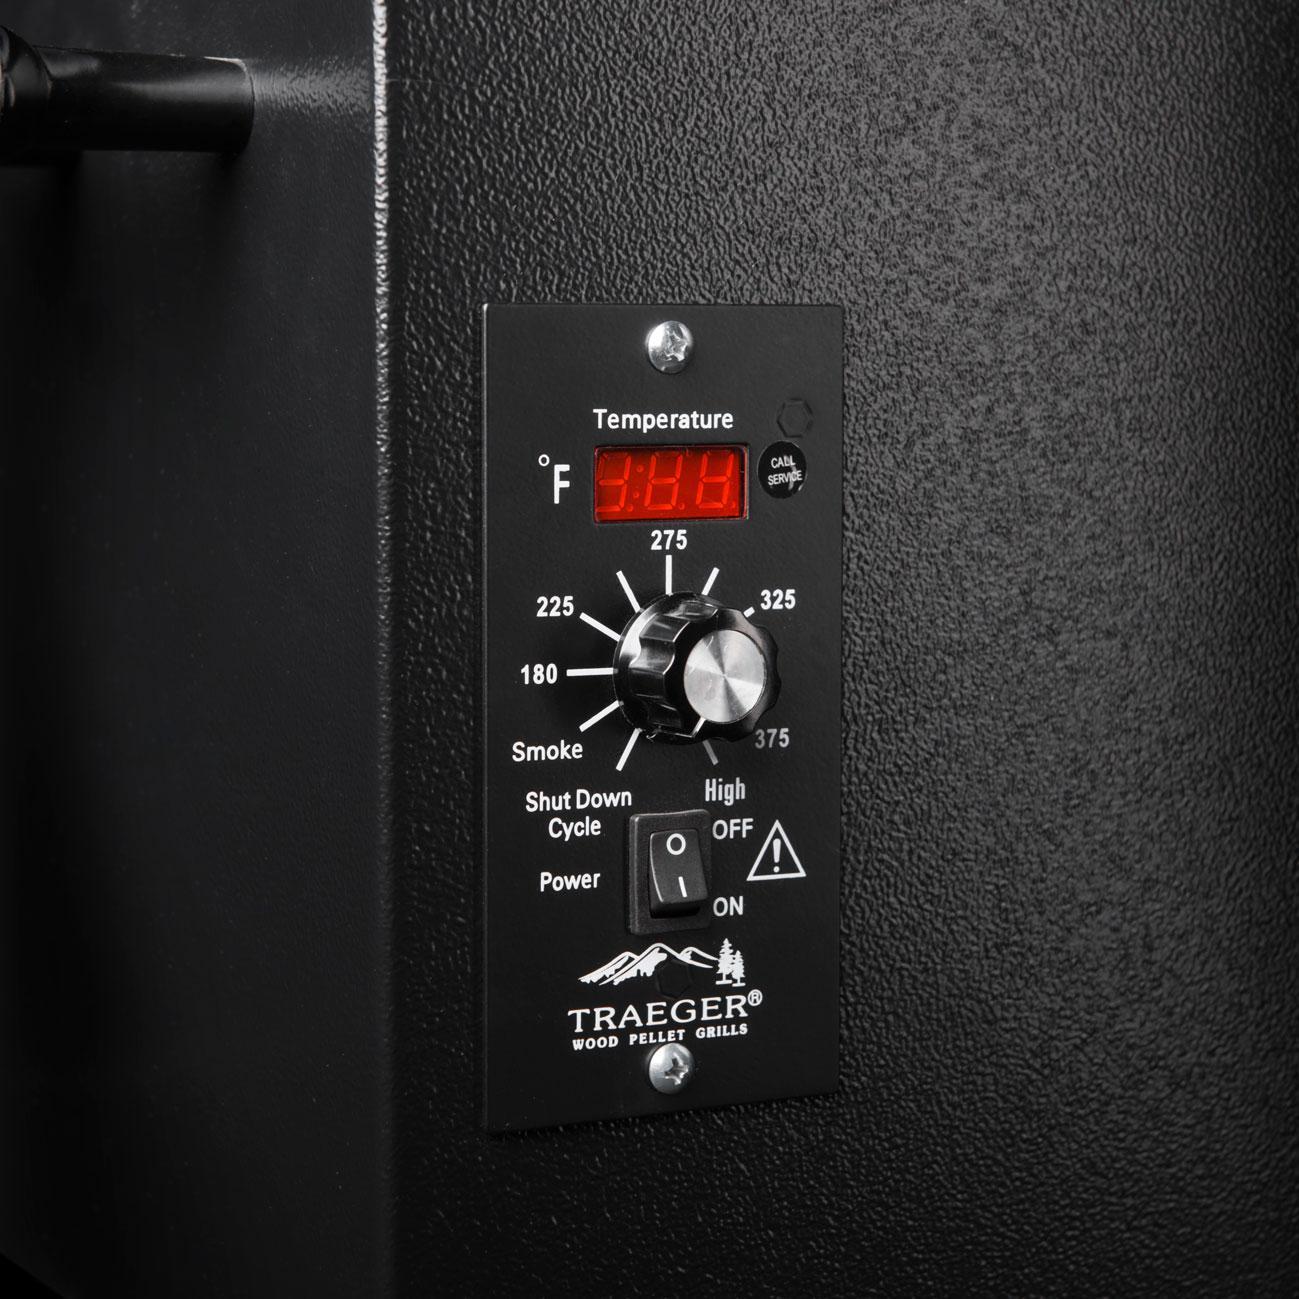 LED Digital, Multi-Position Thermostat Control